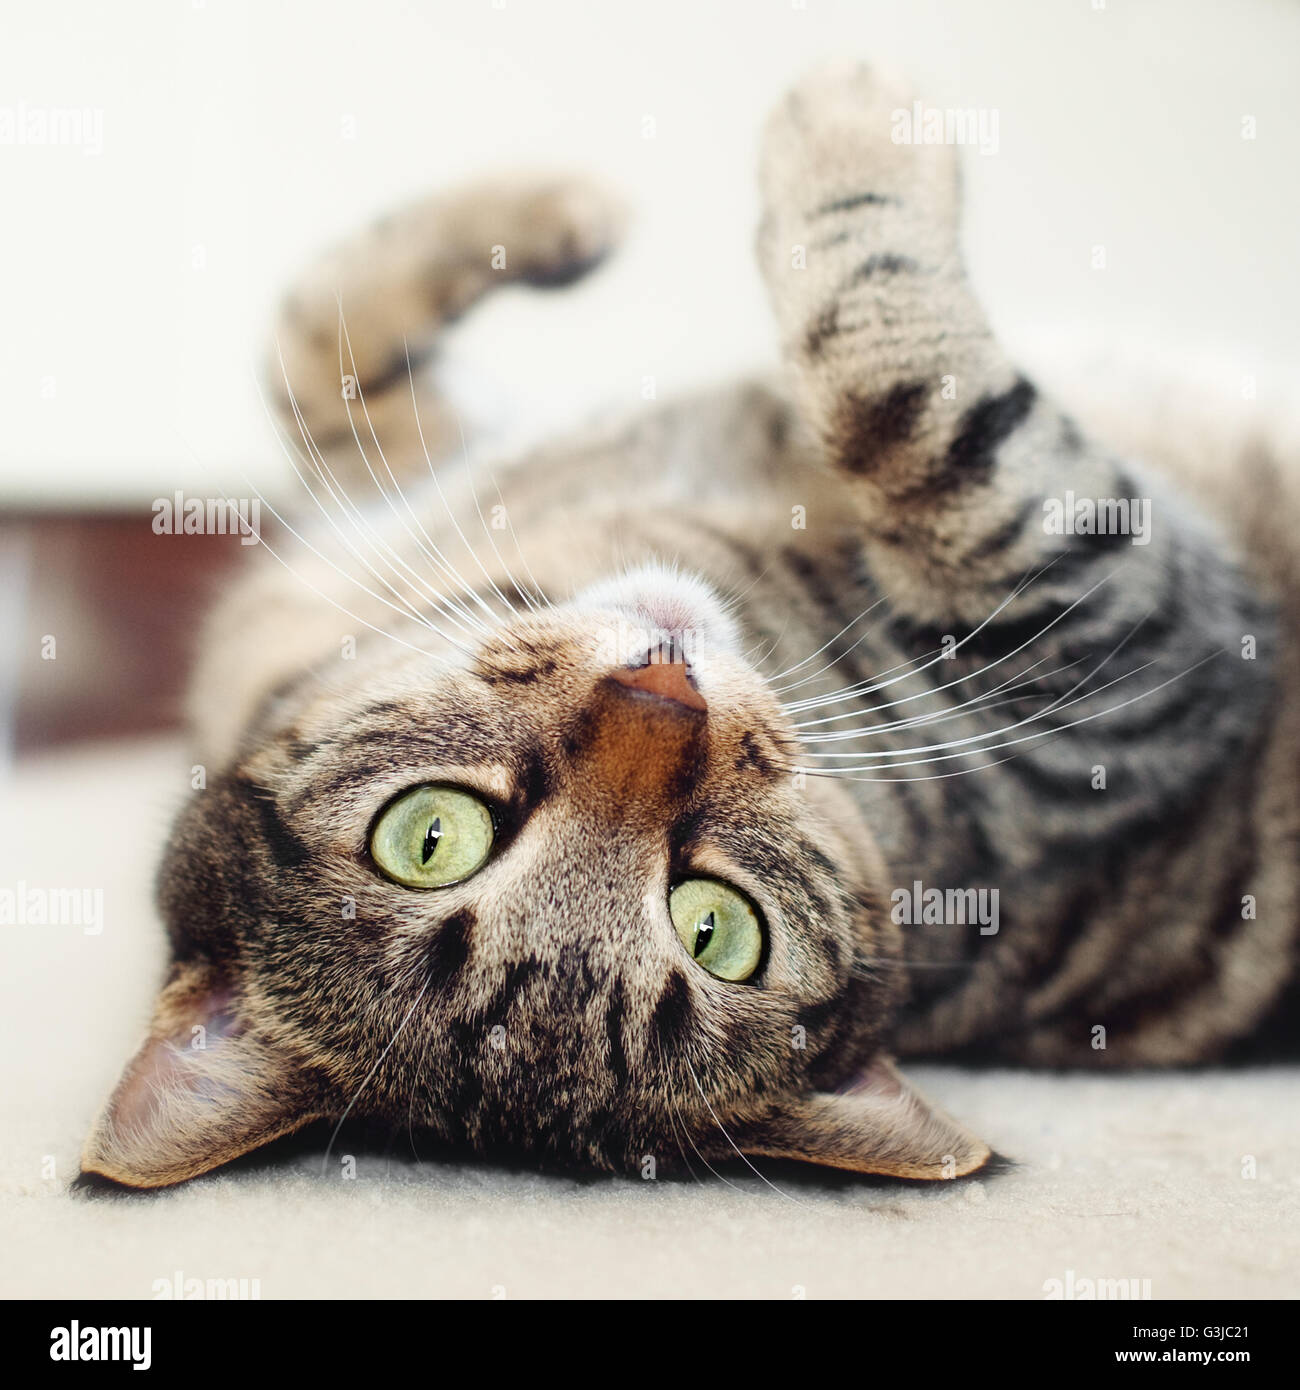 Tabby Katze auf Rücken liegend Stockfoto